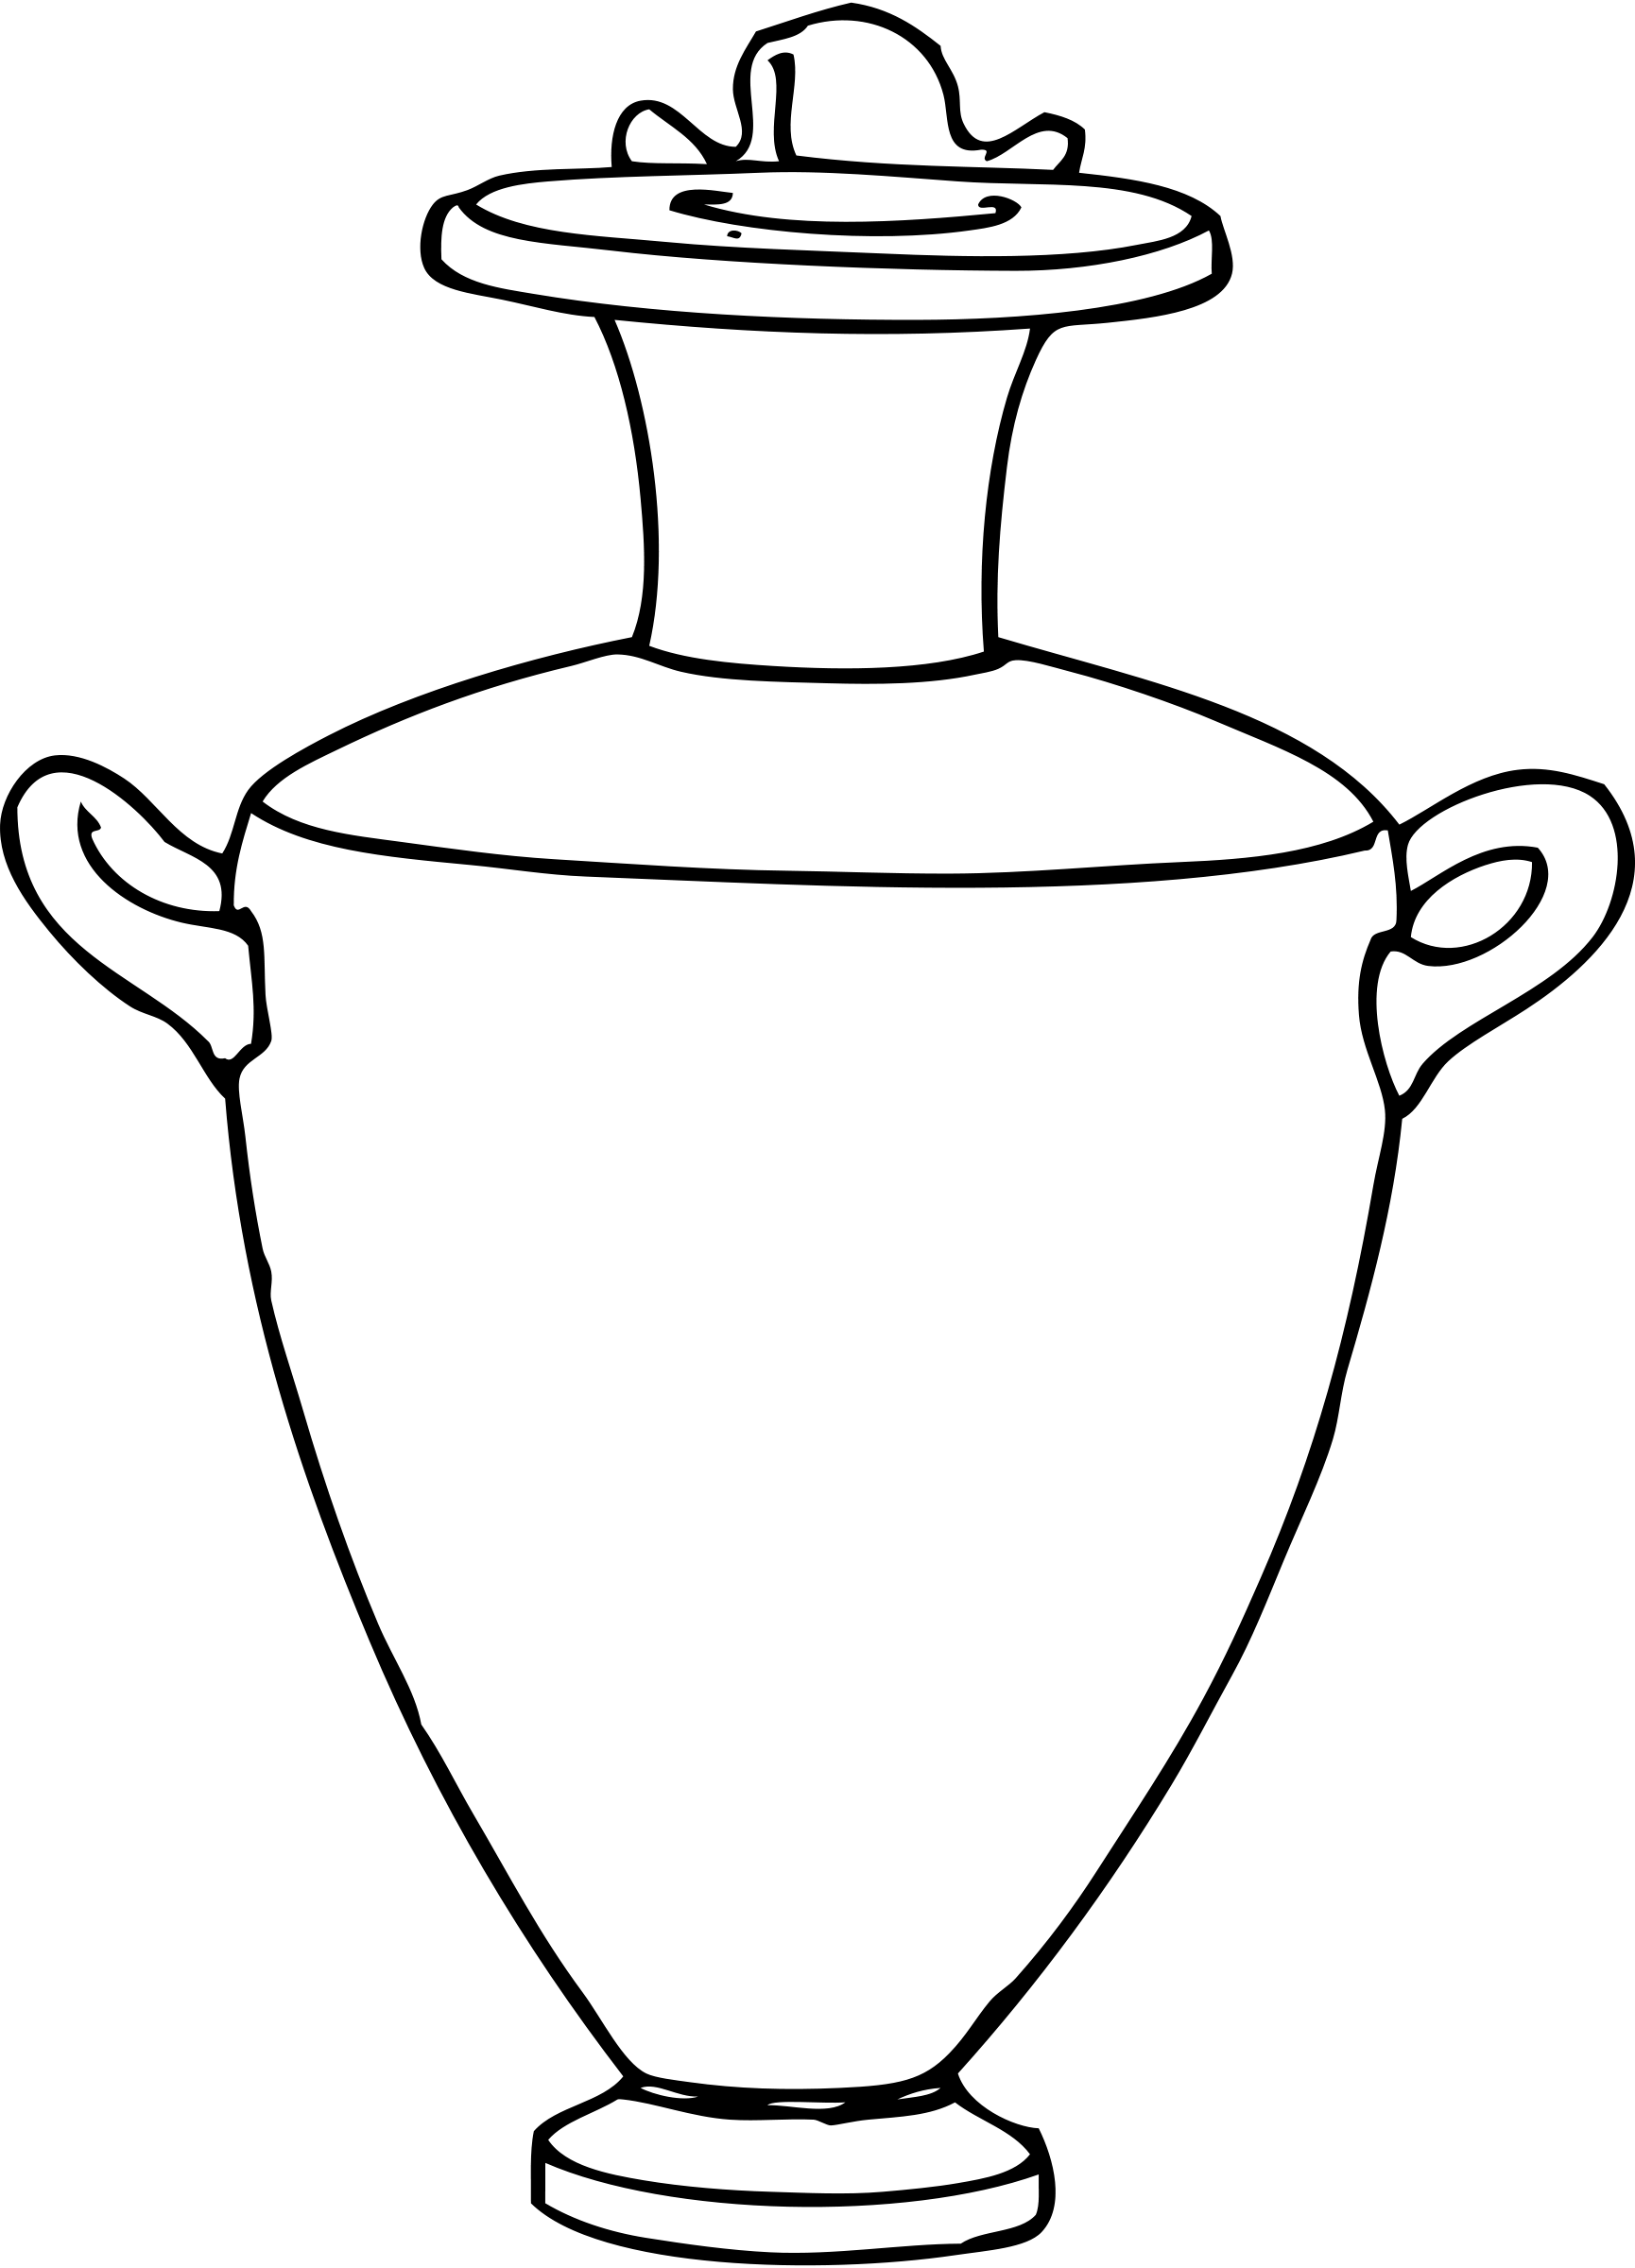 1730x2400 Clip Art Black And White Vase Clipart